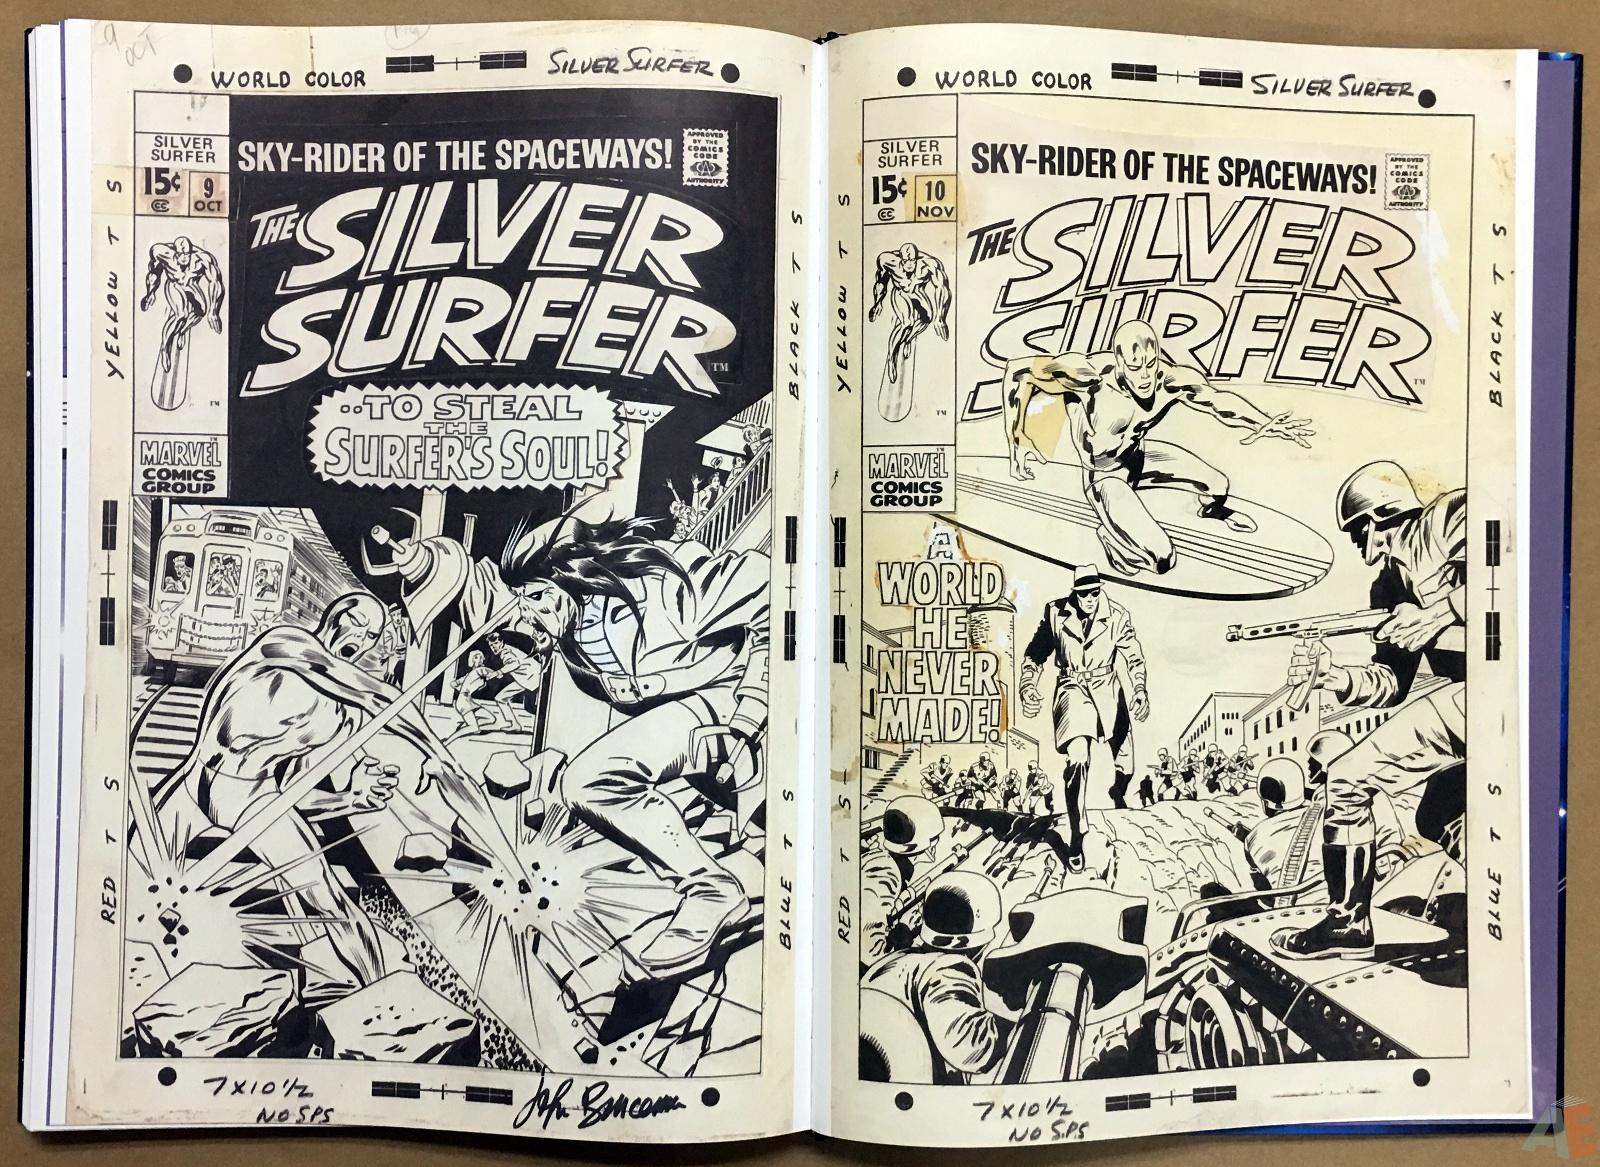 John Buscema's Silver Surfer Artist's Edition 42